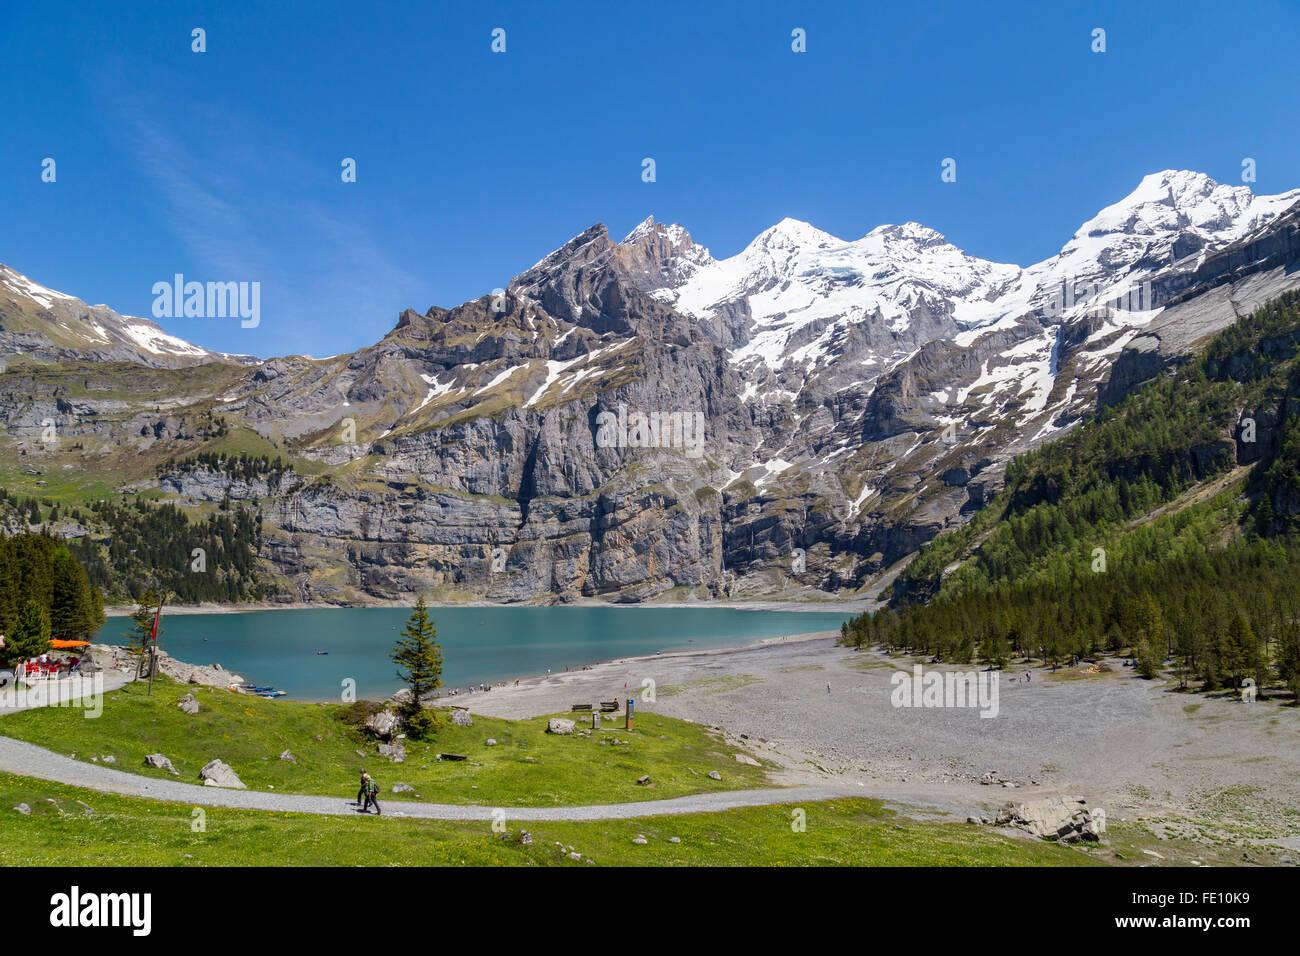 View of Oeschinensee (Oeschinen lake) with Bluemlisalp and Frundenhorn of Swiss alps on Bernese Oberland - Stock Image